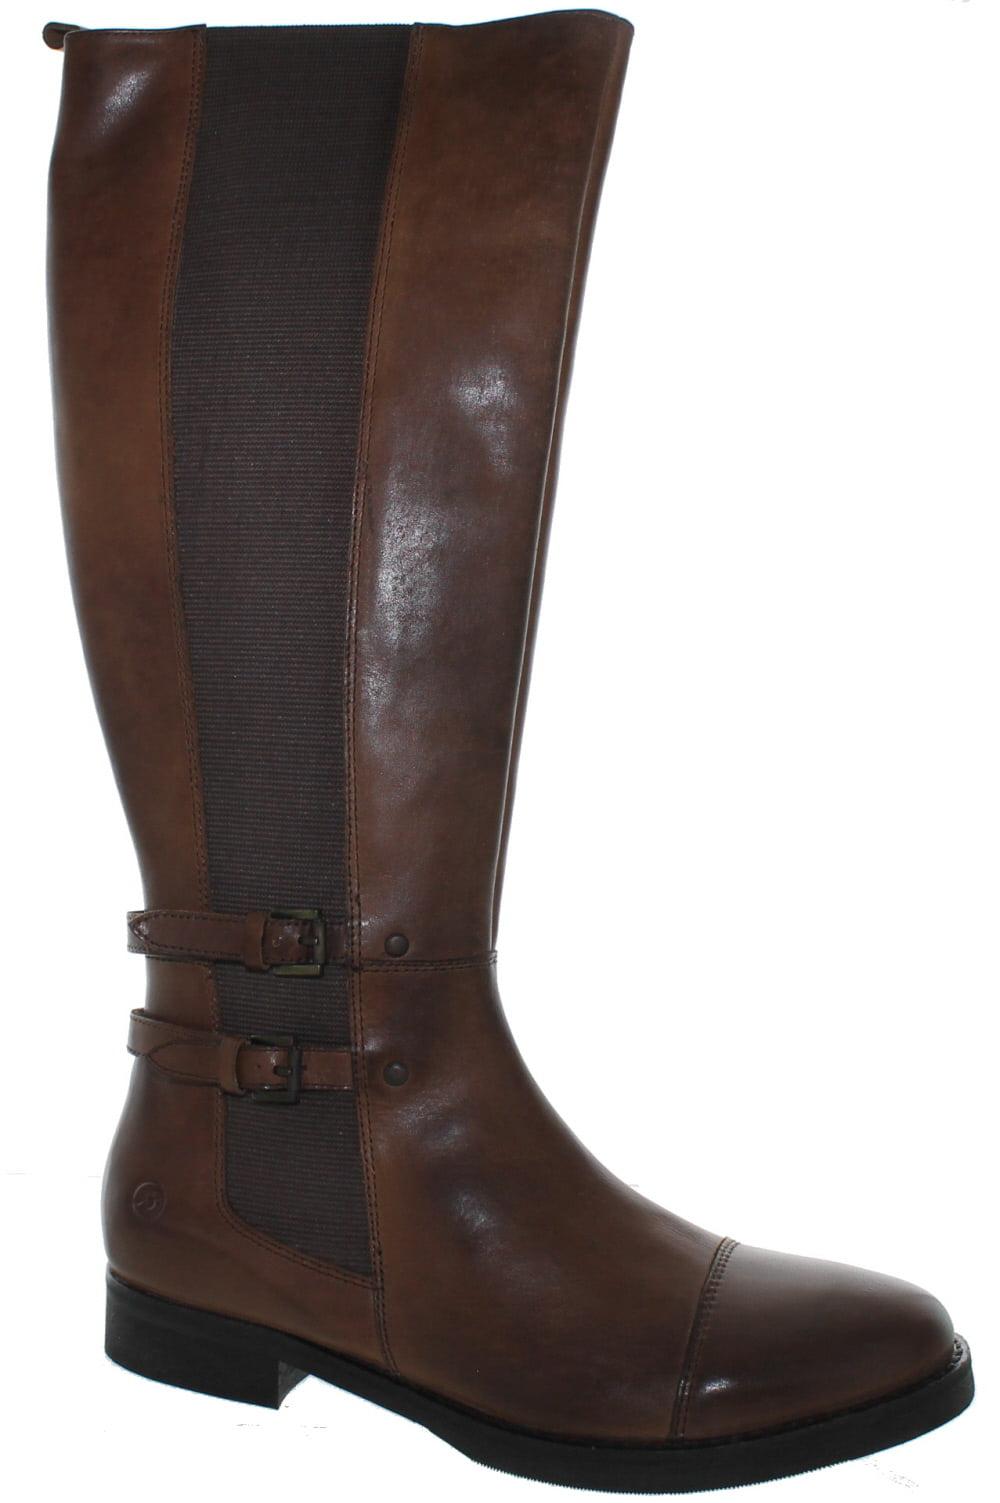 Bronx By Diba True Women's Loop Hole Tall Leather Boots Brown (41.0 EU   11.0M US) by Diba True